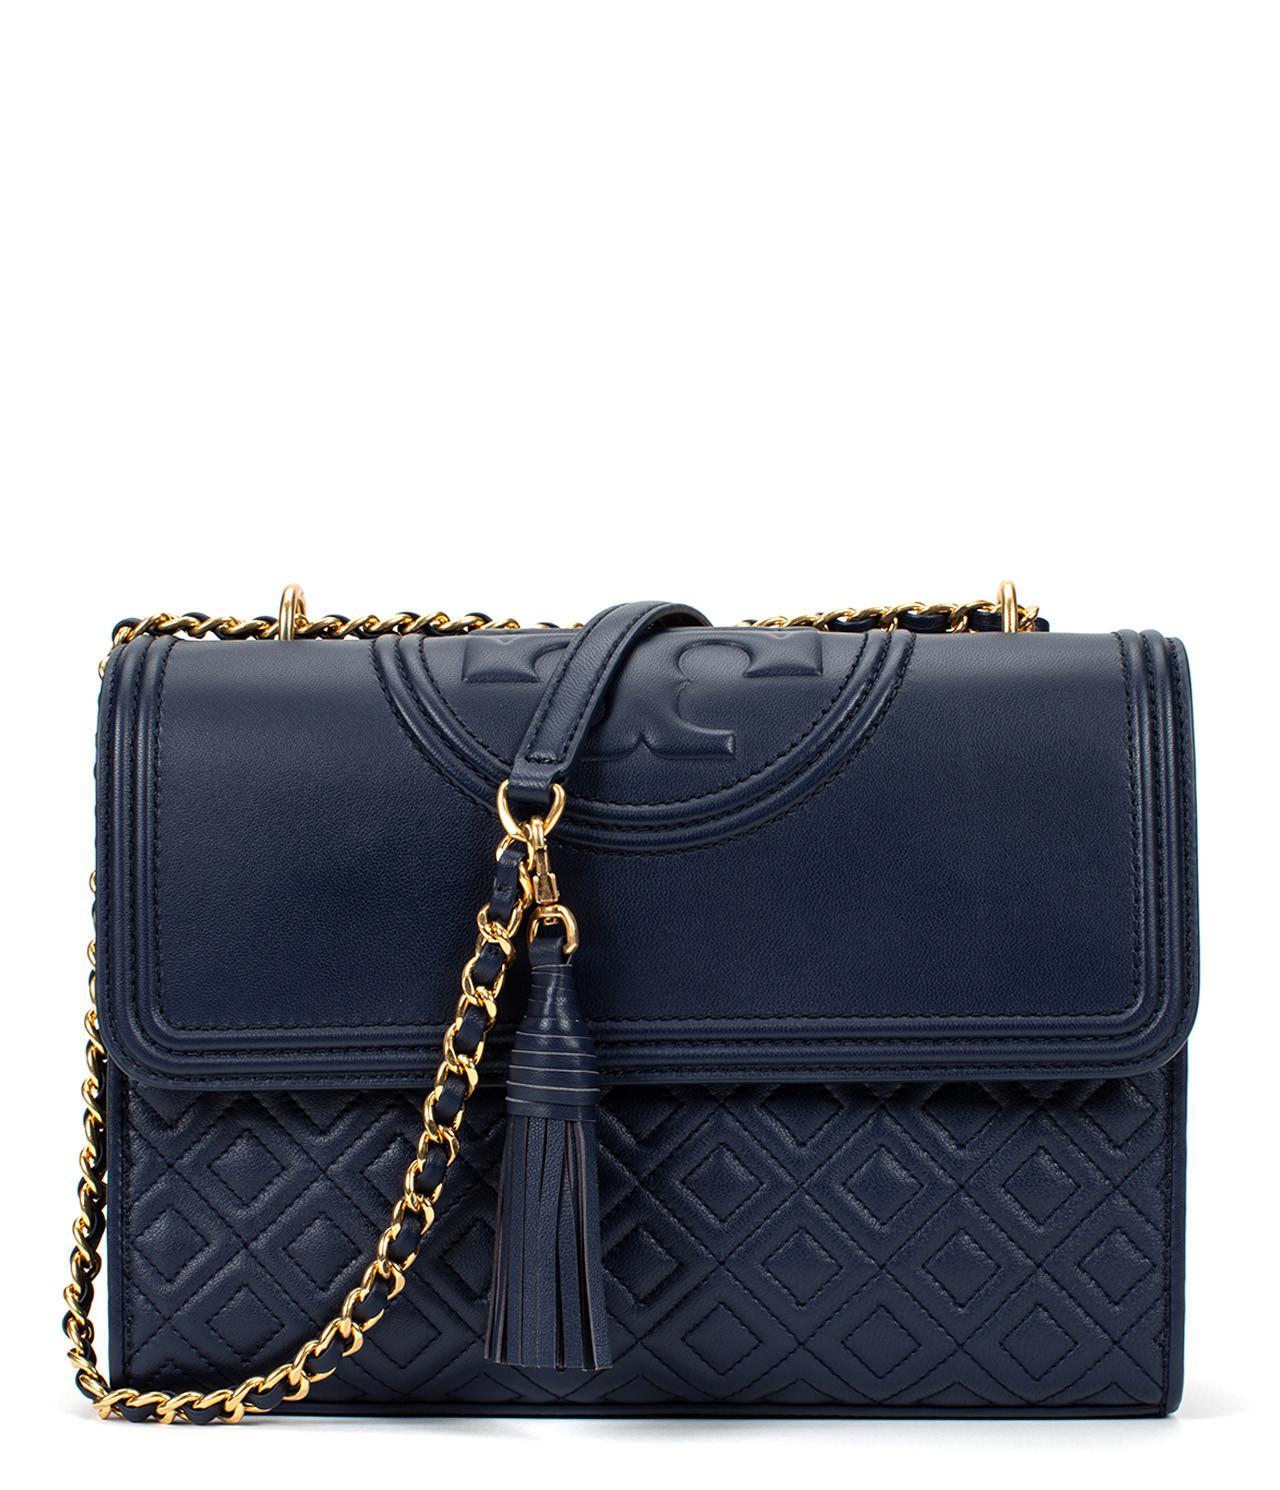 5fc5e4fef37f Tory Burch Fleming Convertible Shoulder Bag in Blue - Lyst